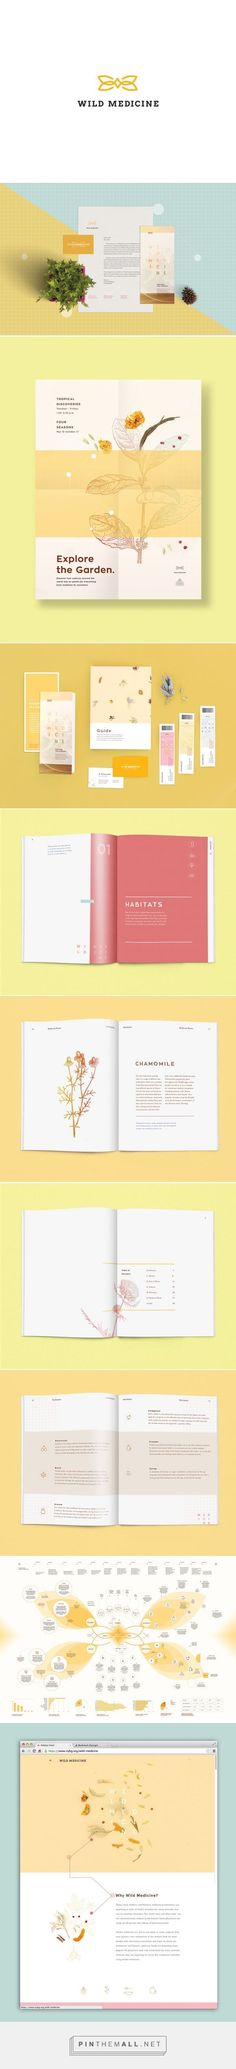 Wild Medicine Branding by Grace Kuk on Behance | Fivestar Branding – Design and…